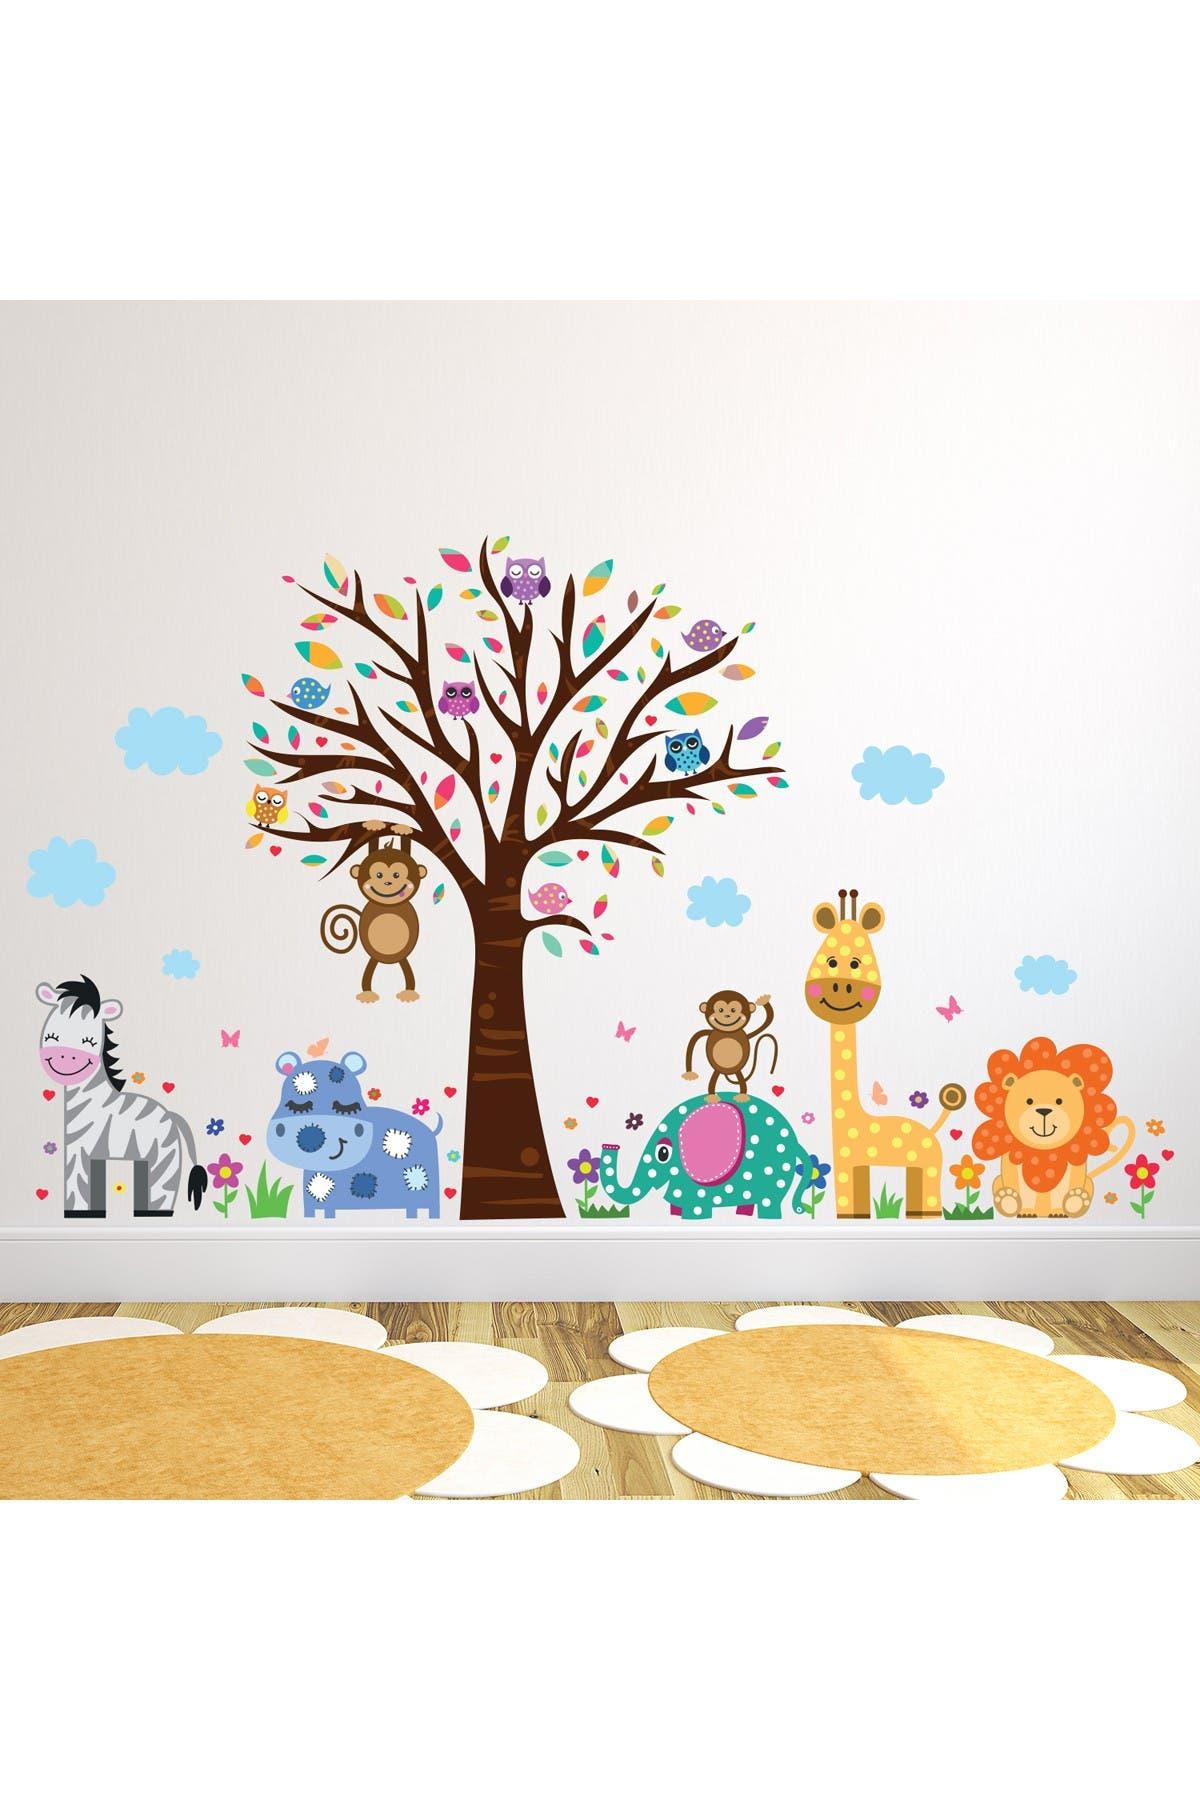 Image of WalPlus Happy London Zoo Animal Tree Kids Art Decal